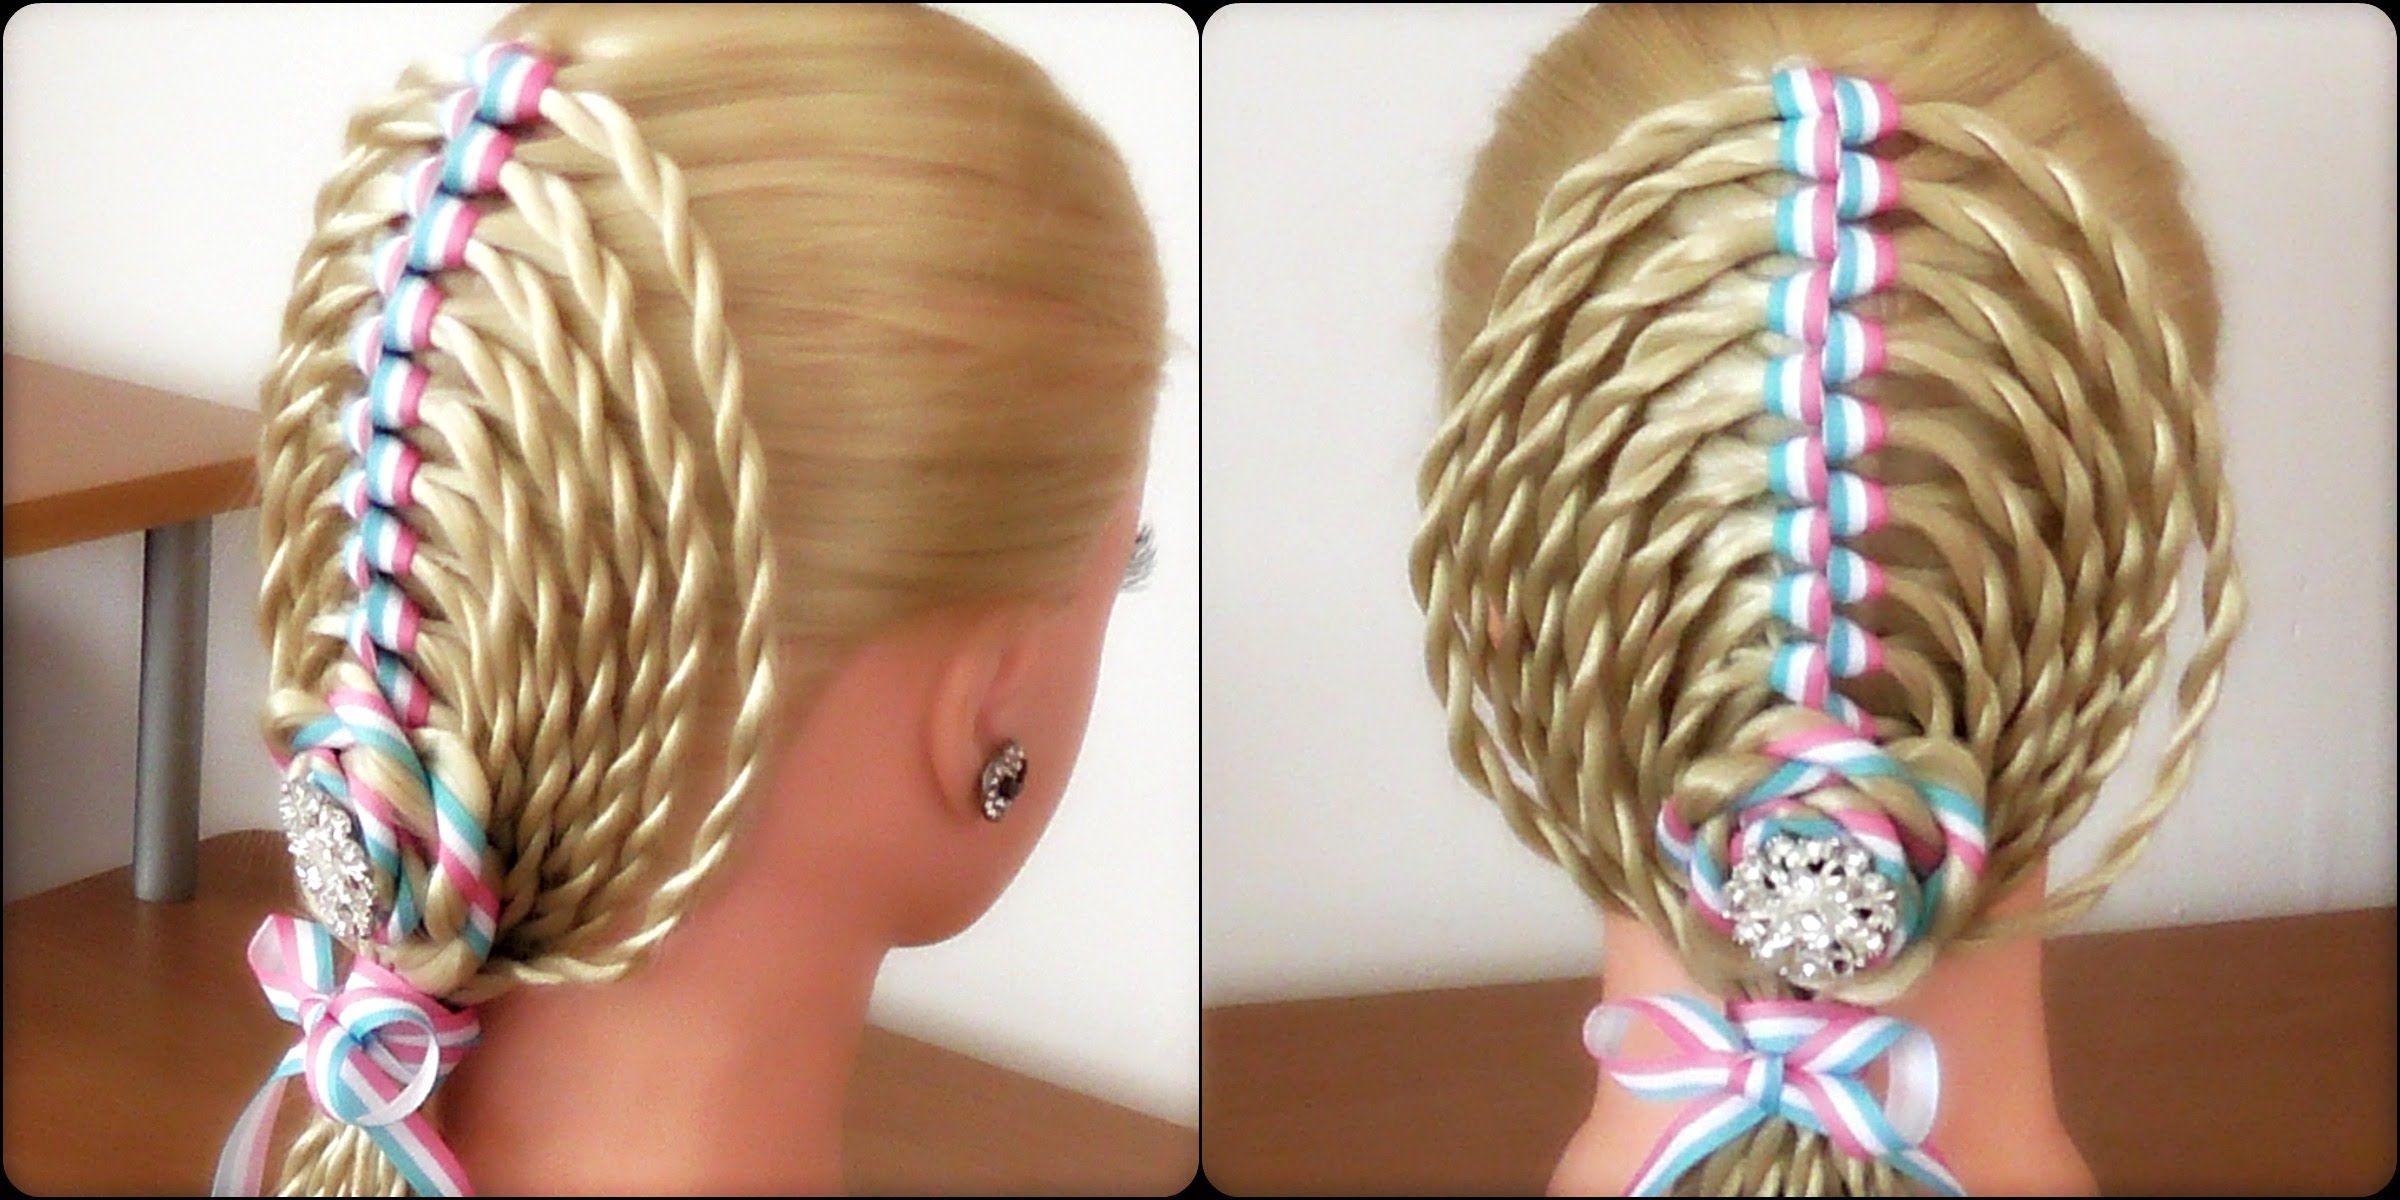 The Ribbon Twist Braid Hairstyle Hair Tutorial Hairglamour Peinados Con Cintas Videos De Peinados Peinados Para Ninas